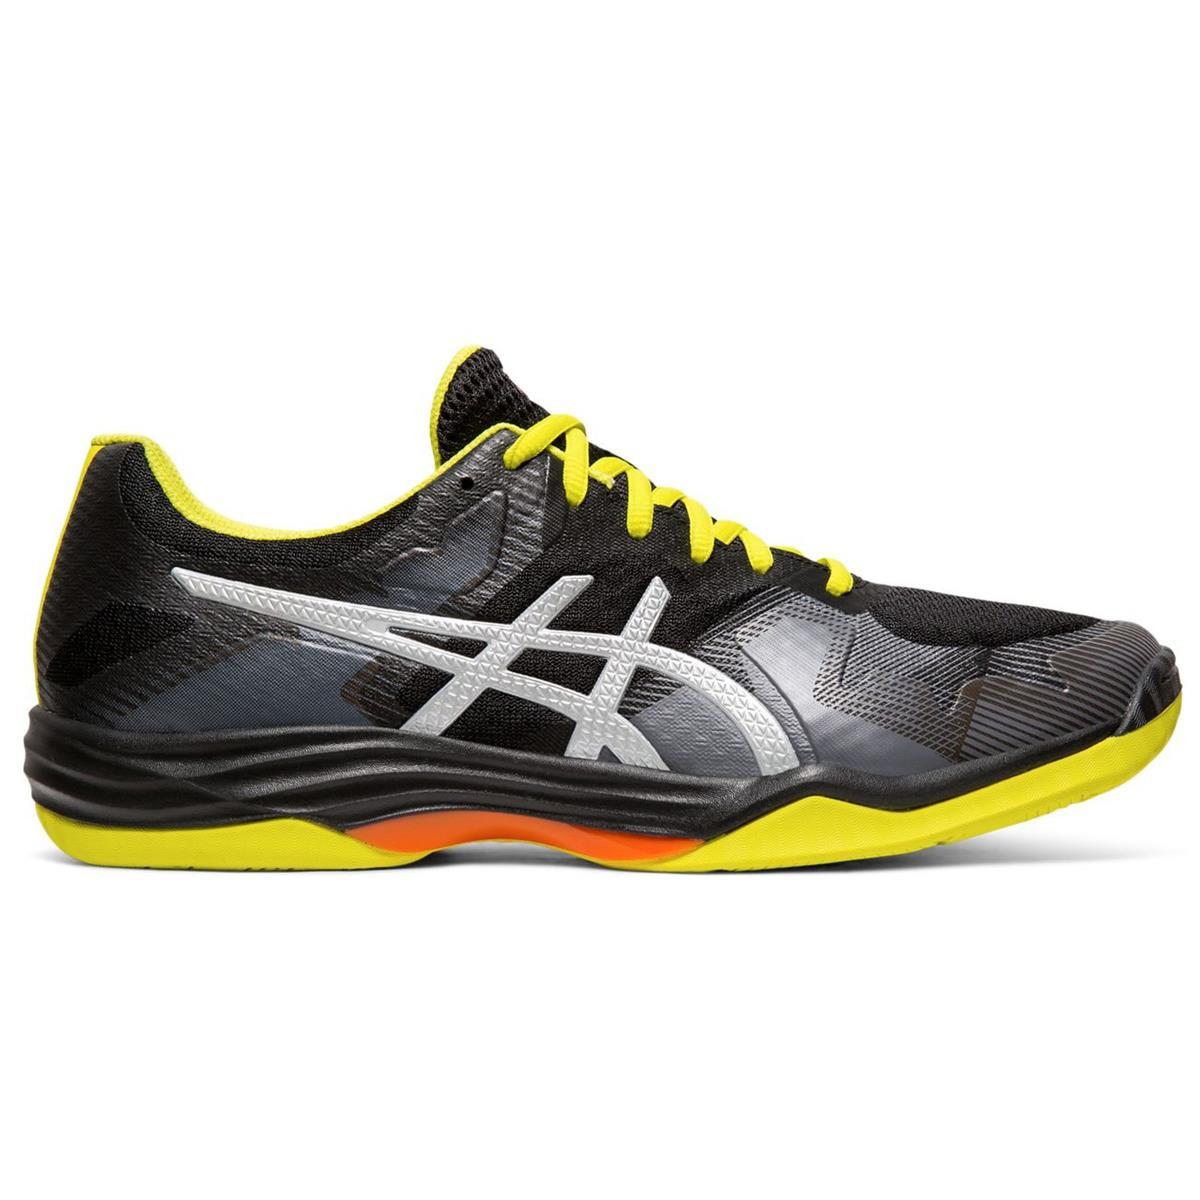 Asics Gel Tactic 2 Mens Court Shoes (Black-Silver) | Direct Badminton